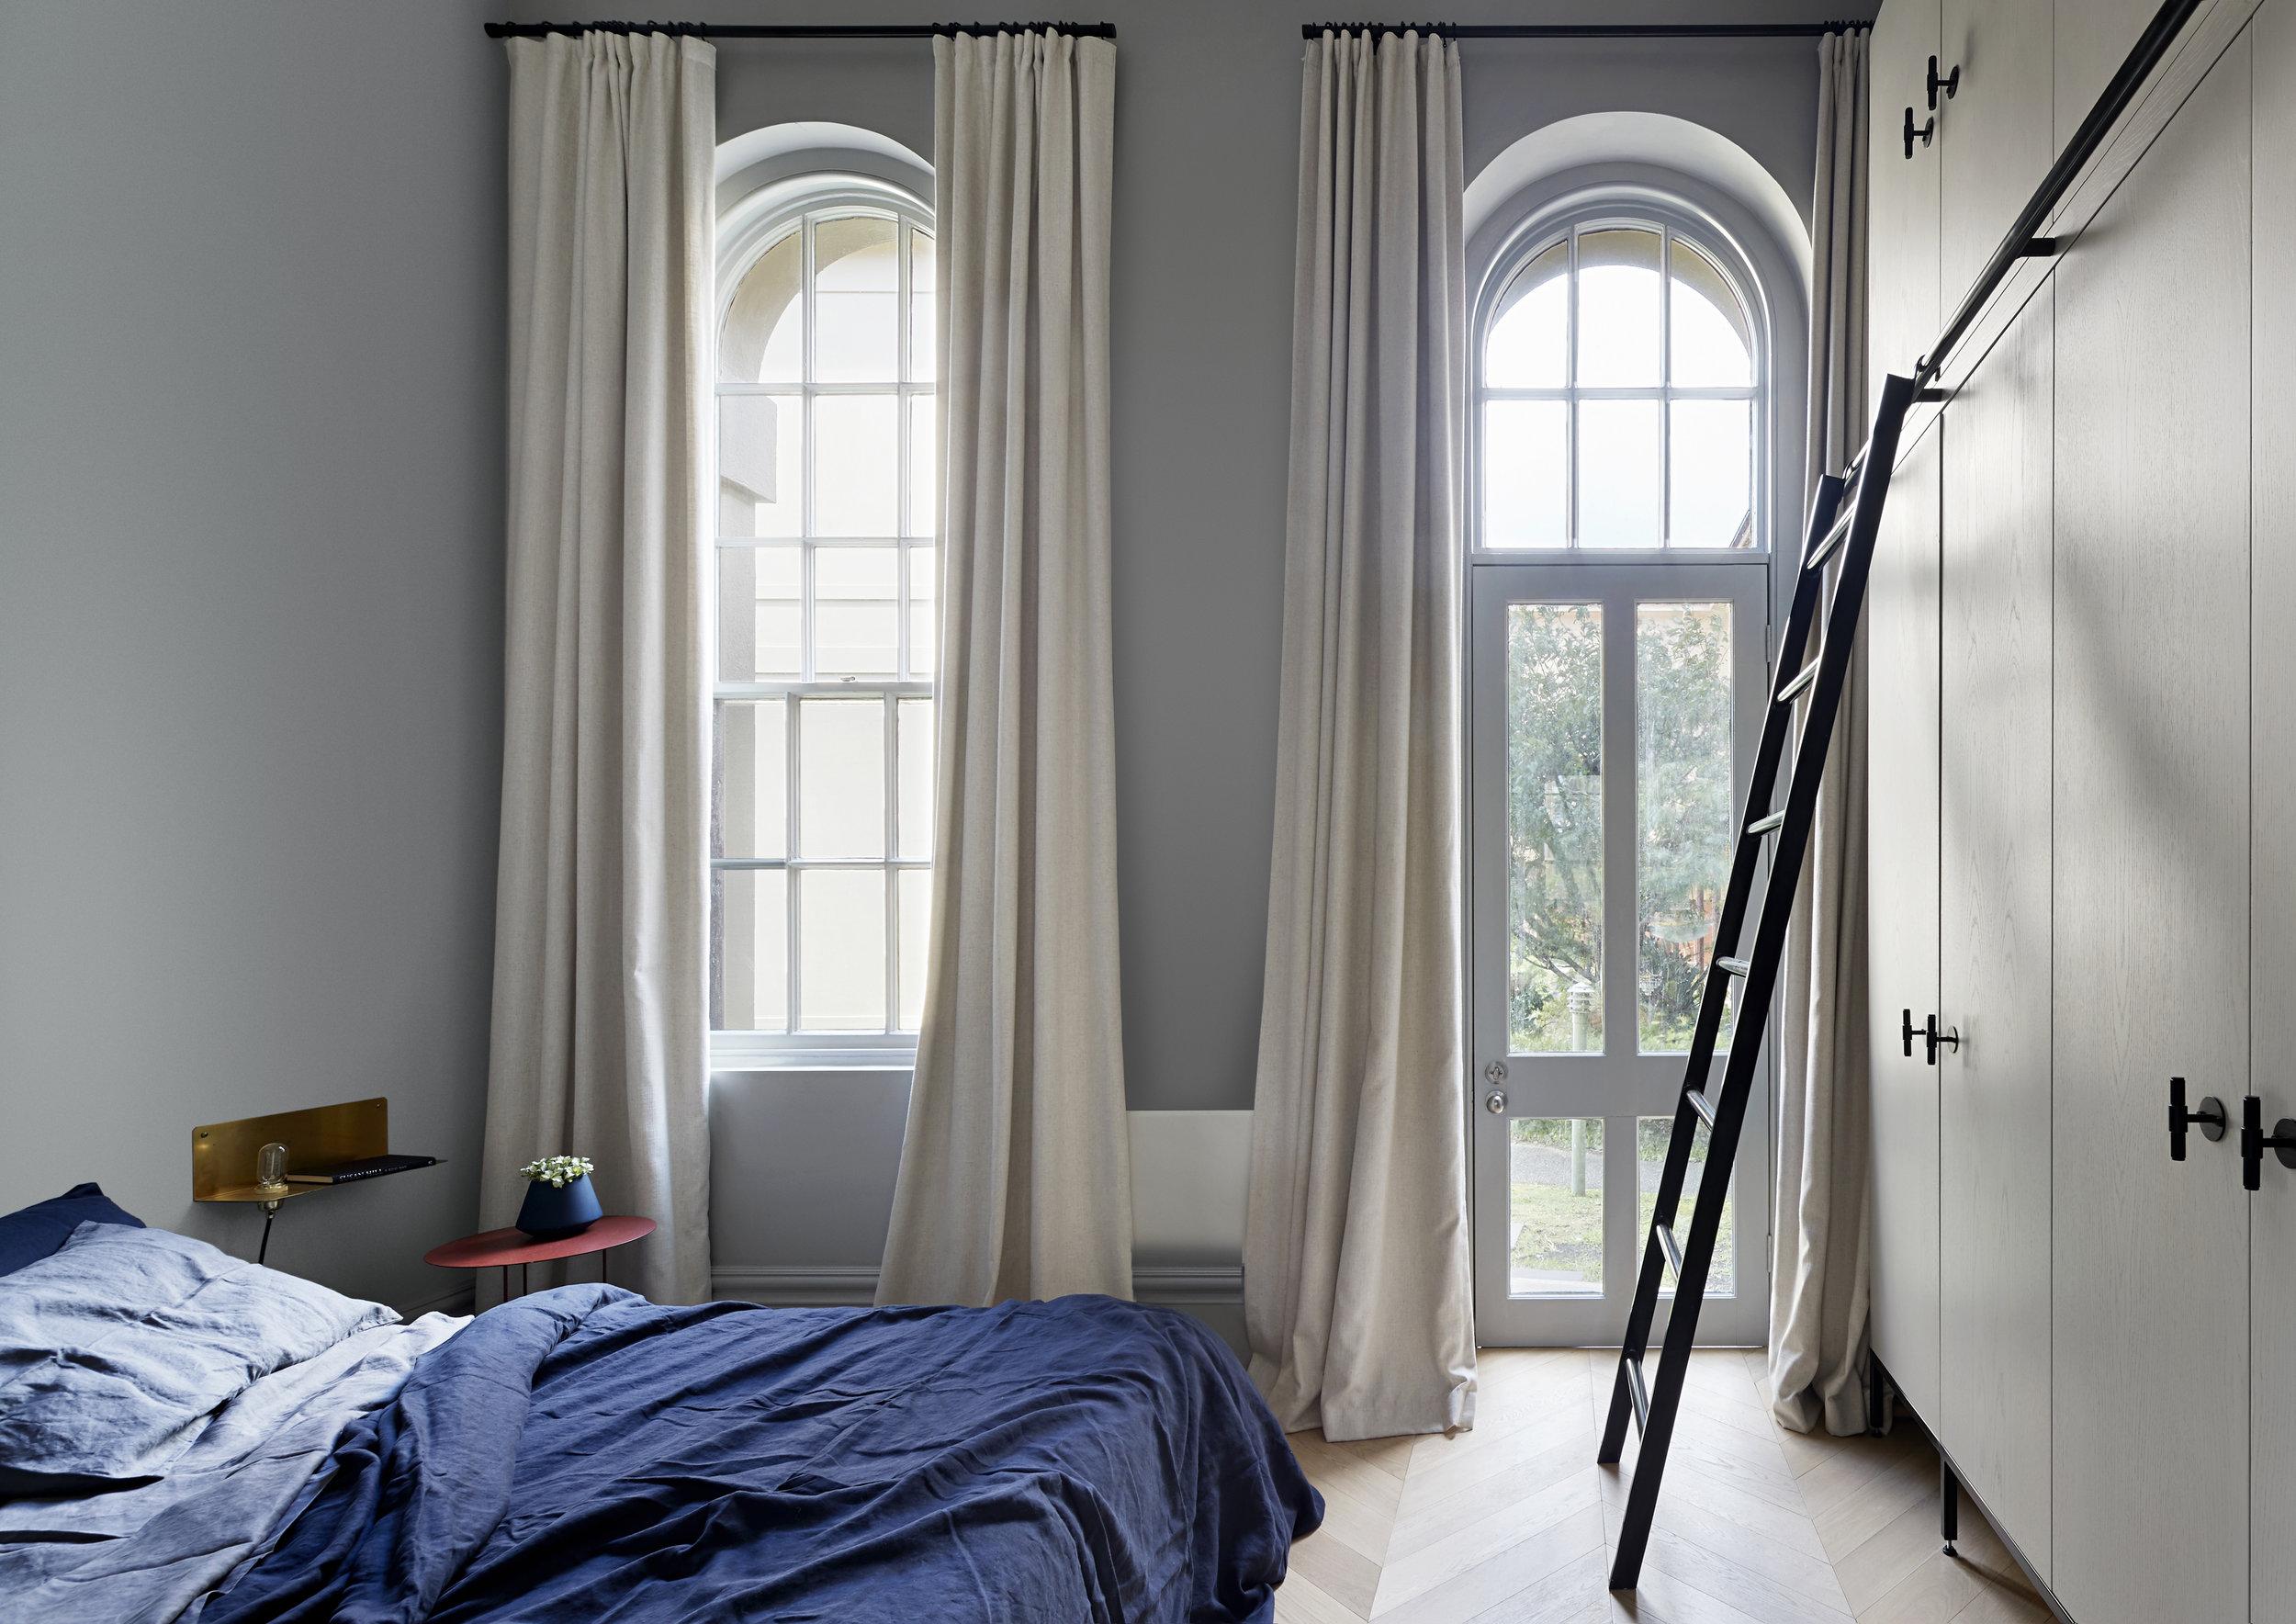 techne-kew-apartment-sarah-wolfendale-melbourne-sm-8300.jpg